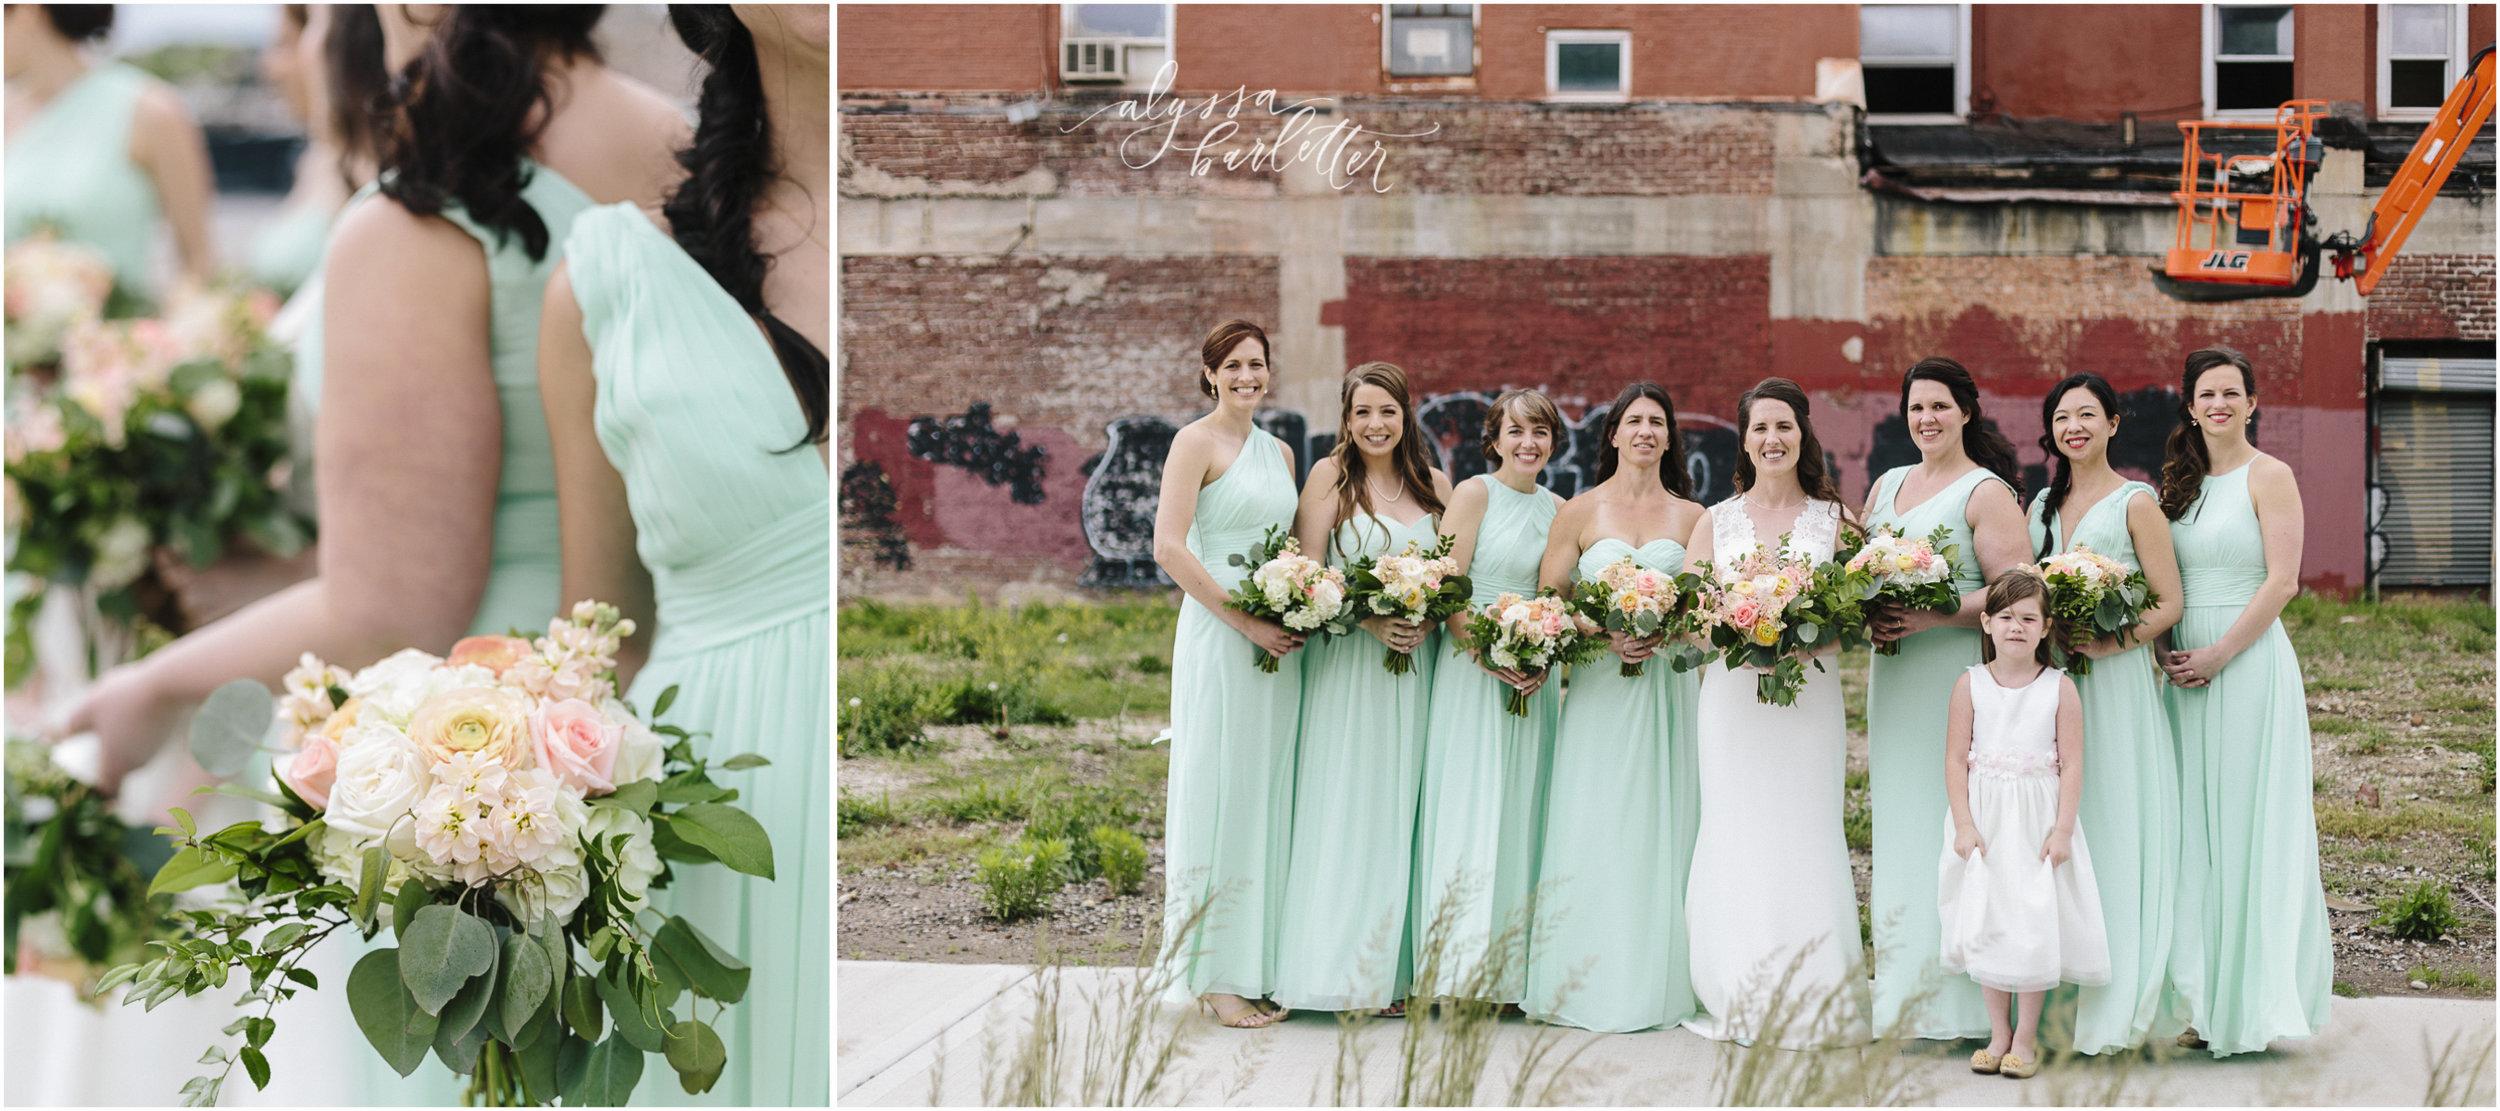 alyssa barletter photography kansas city wedding 2016 main courtney and brian-1-23.jpg